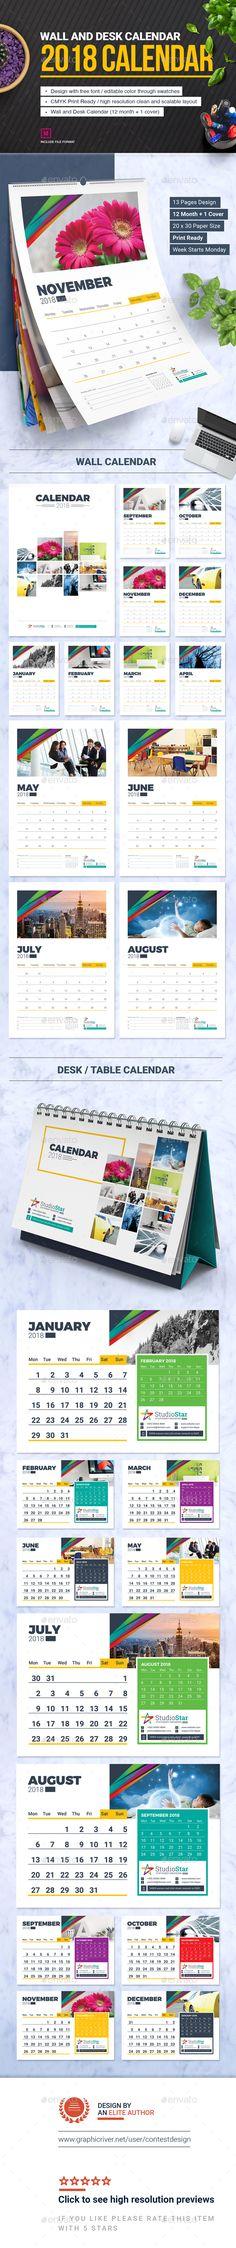 2018 Calendar Design Template | Wall and Desk / Table Calendar 2018 - Calendars Stationery